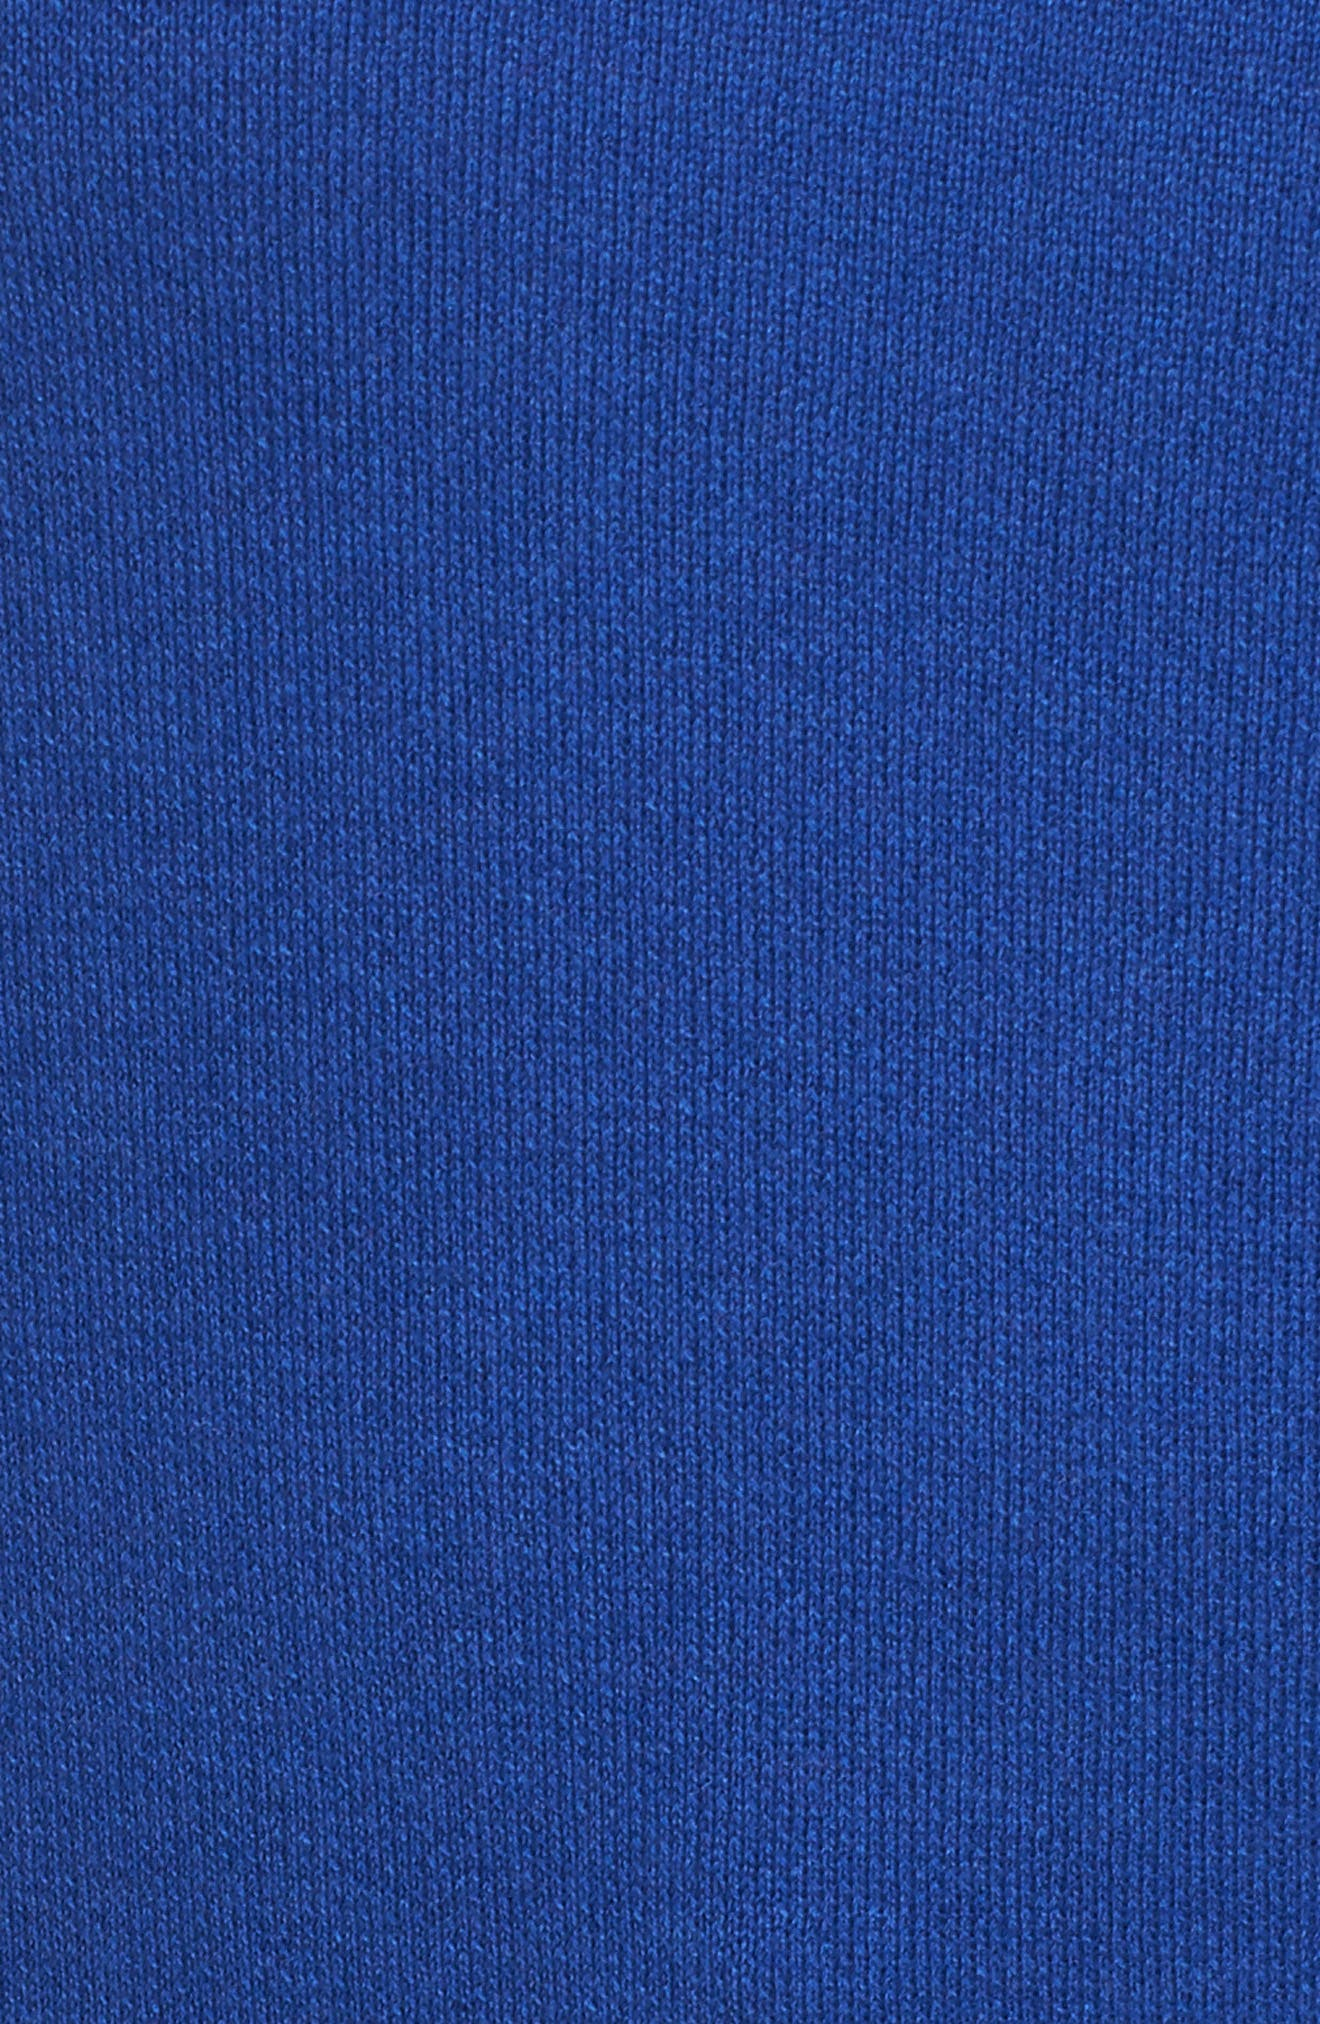 Dolman Sleeve Crewneck Sweater,                             Alternate thumbnail 24, color,